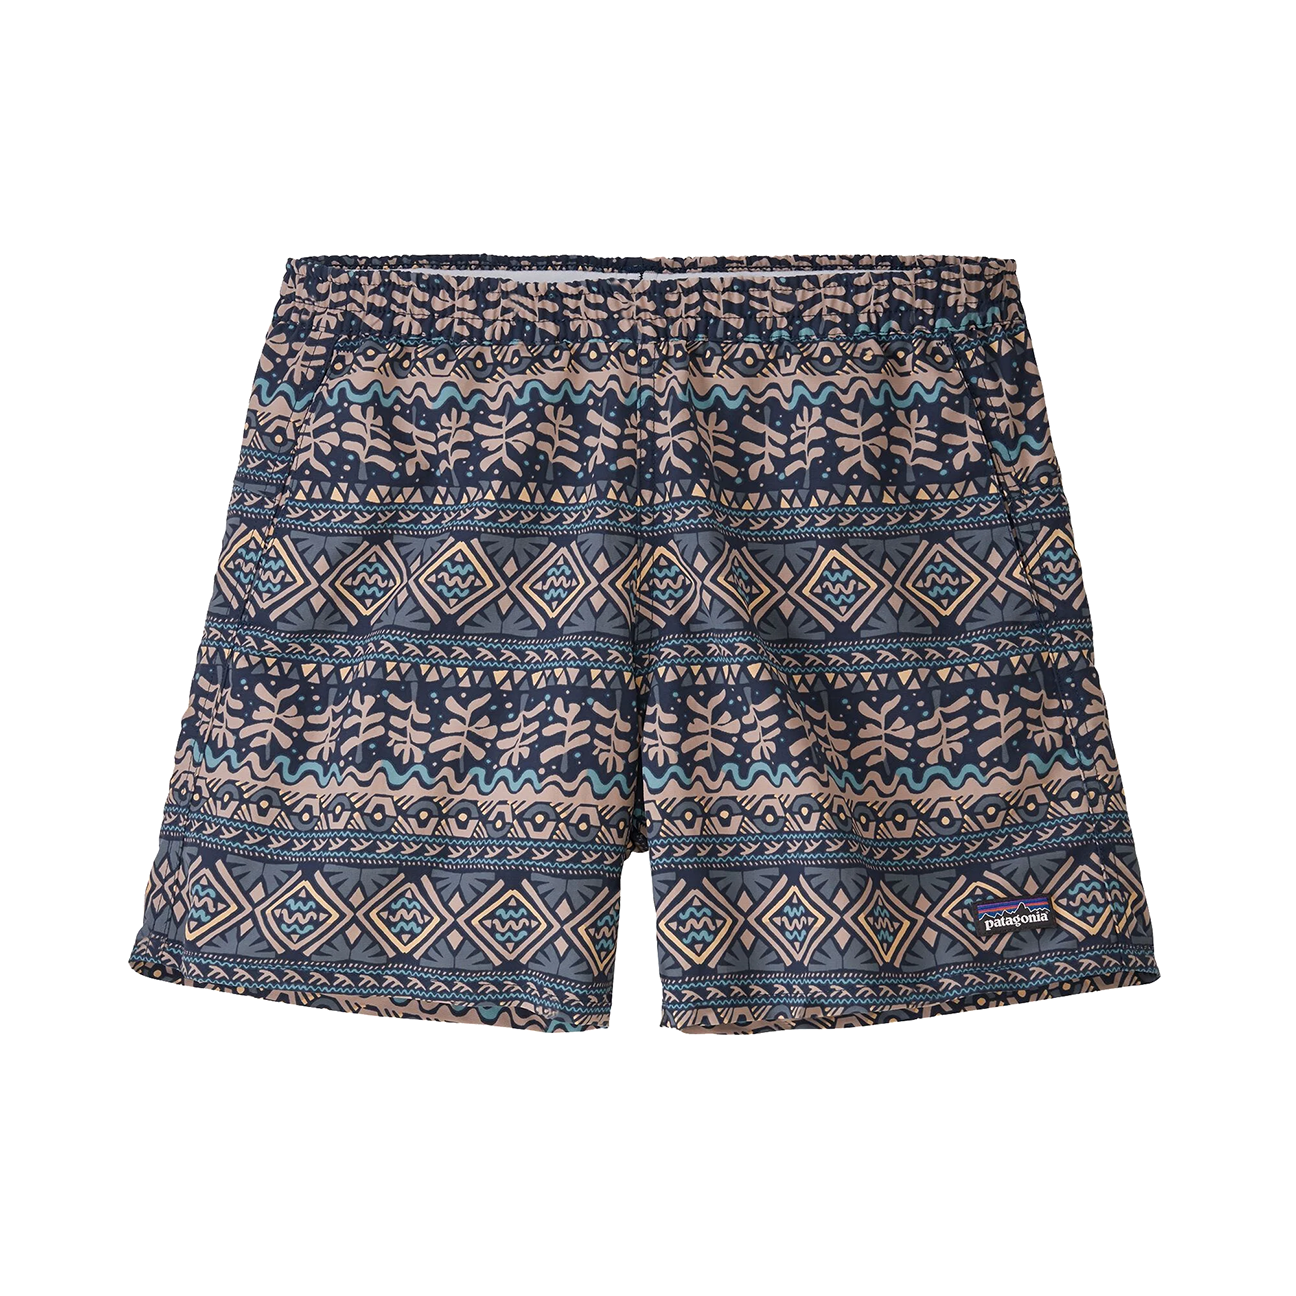 "Women's Baggies Shorts Mangrove Tiki: Tidepool Blue - 5""-1"